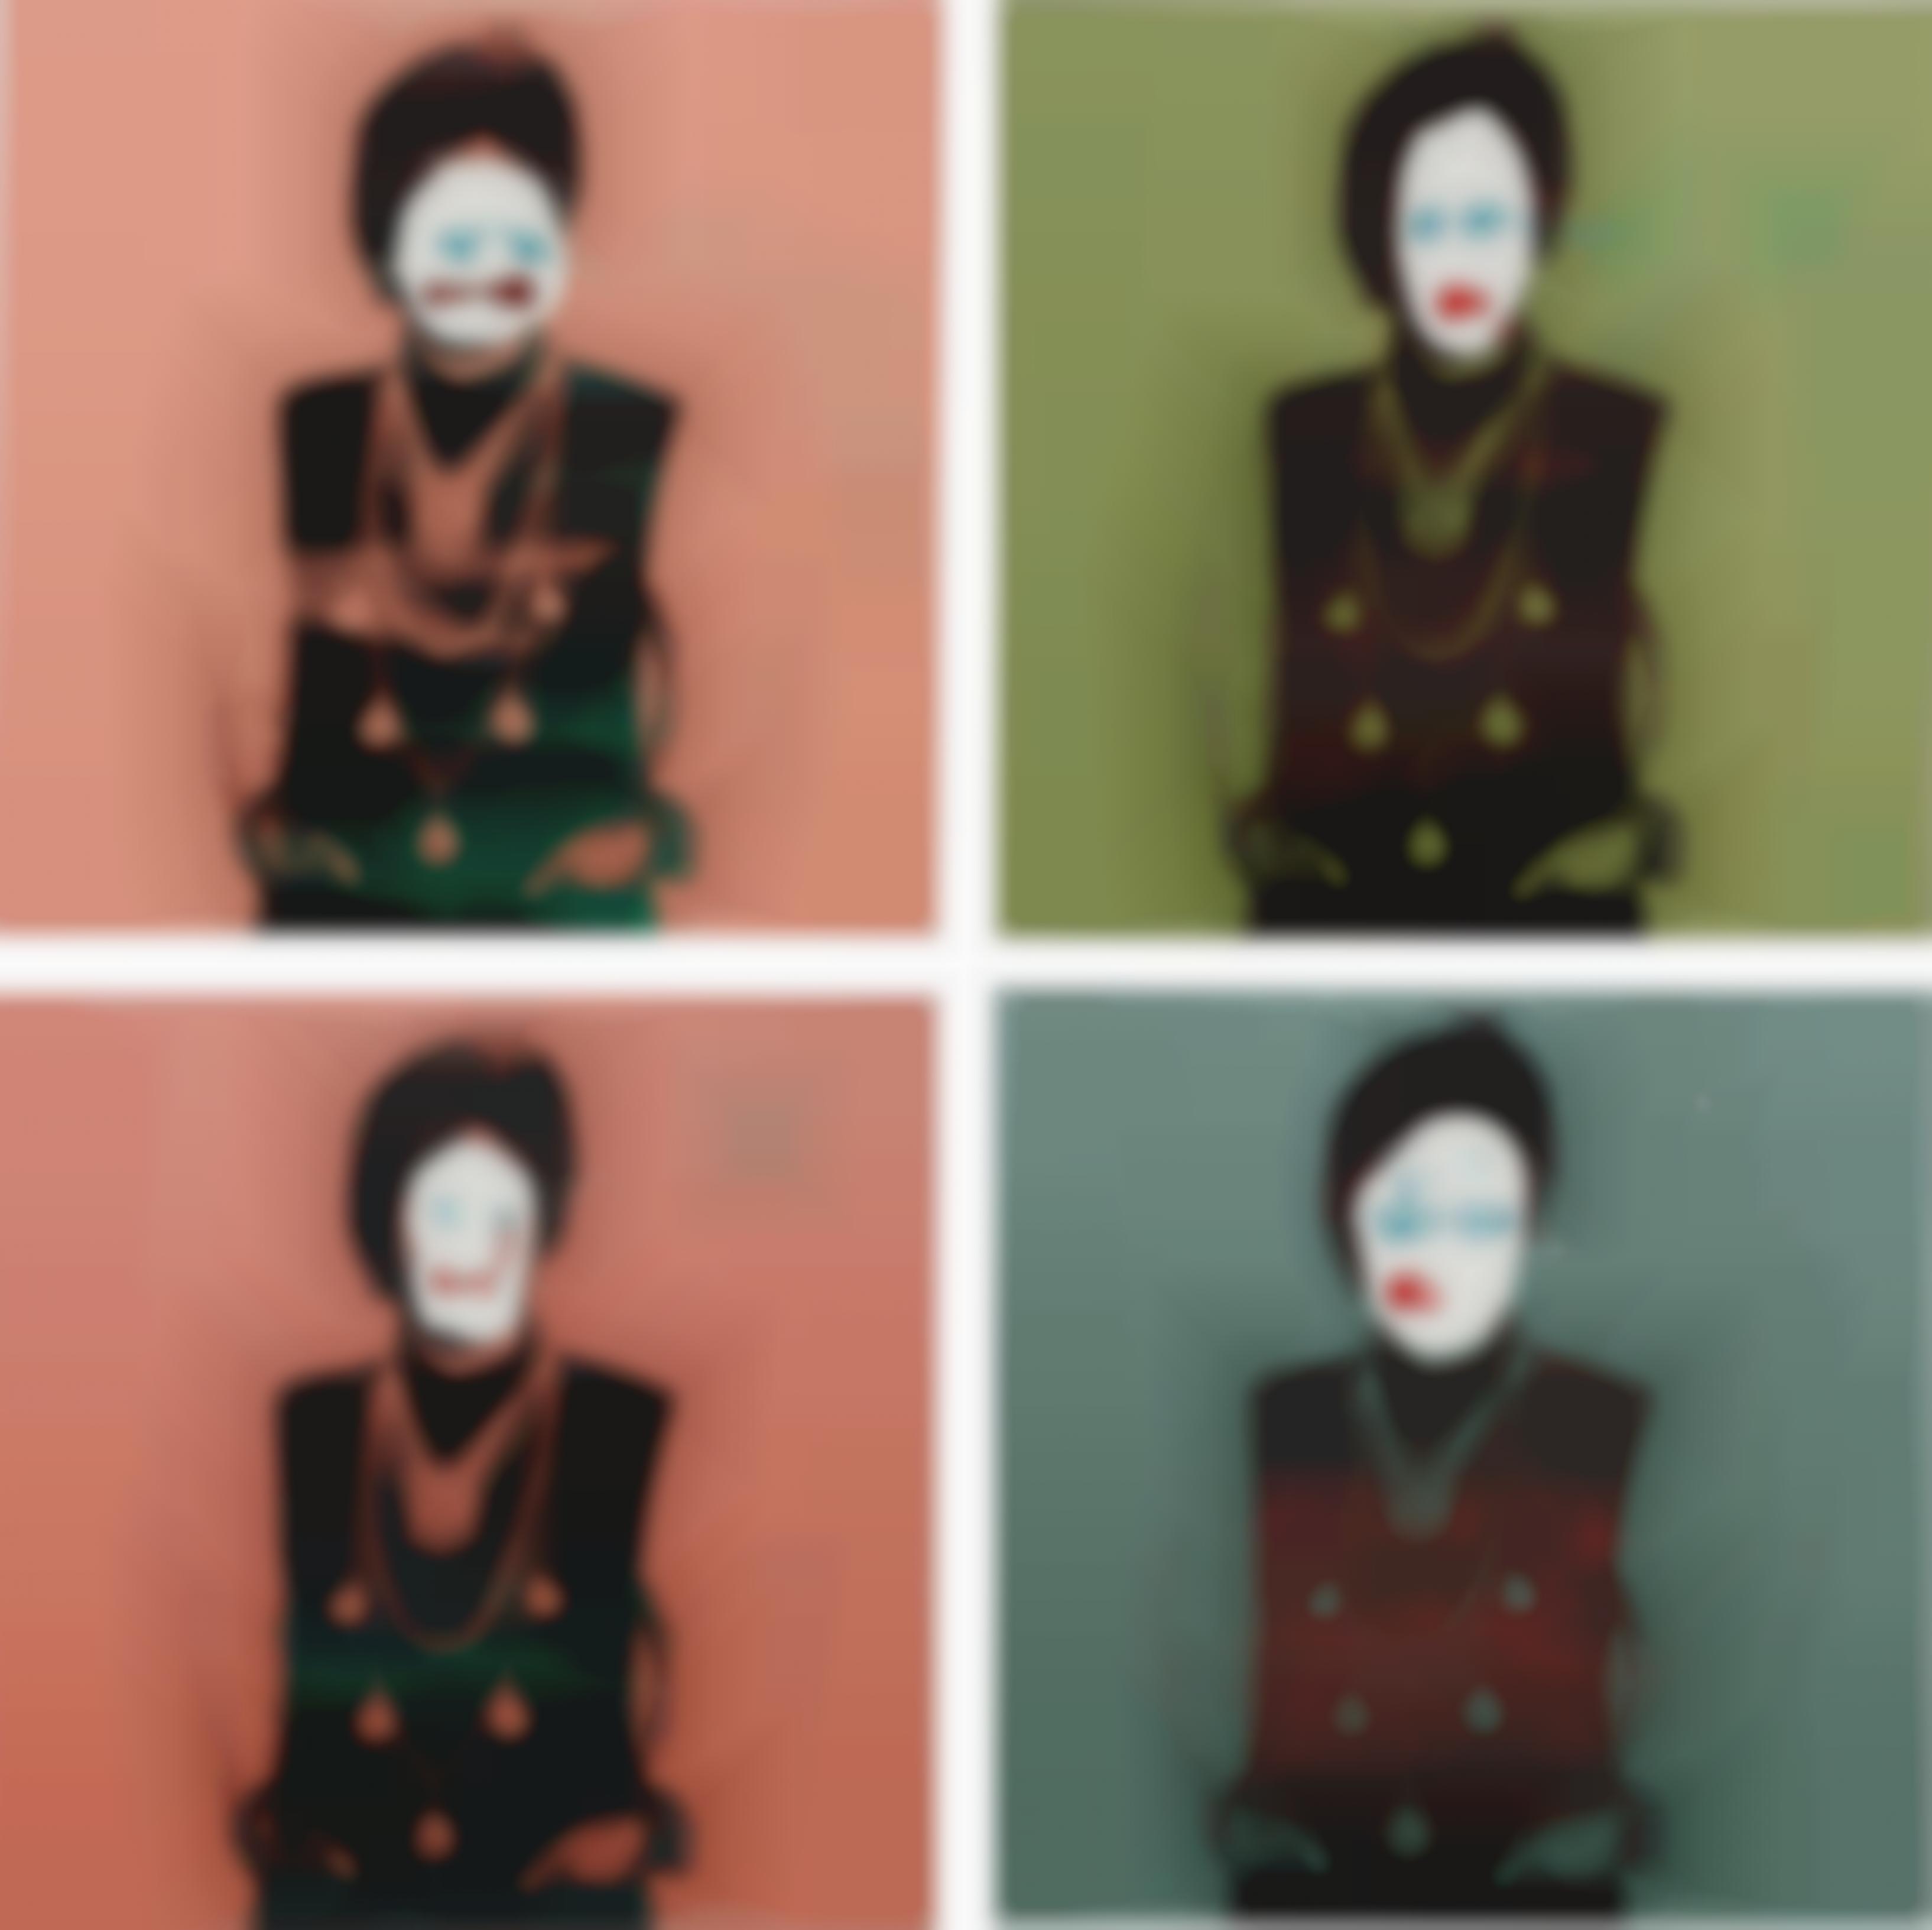 Bruce High Quality Foundation-Self Portrait 1, Self Portrait 2, Self Portrait 3, Self Portrait 4-2011